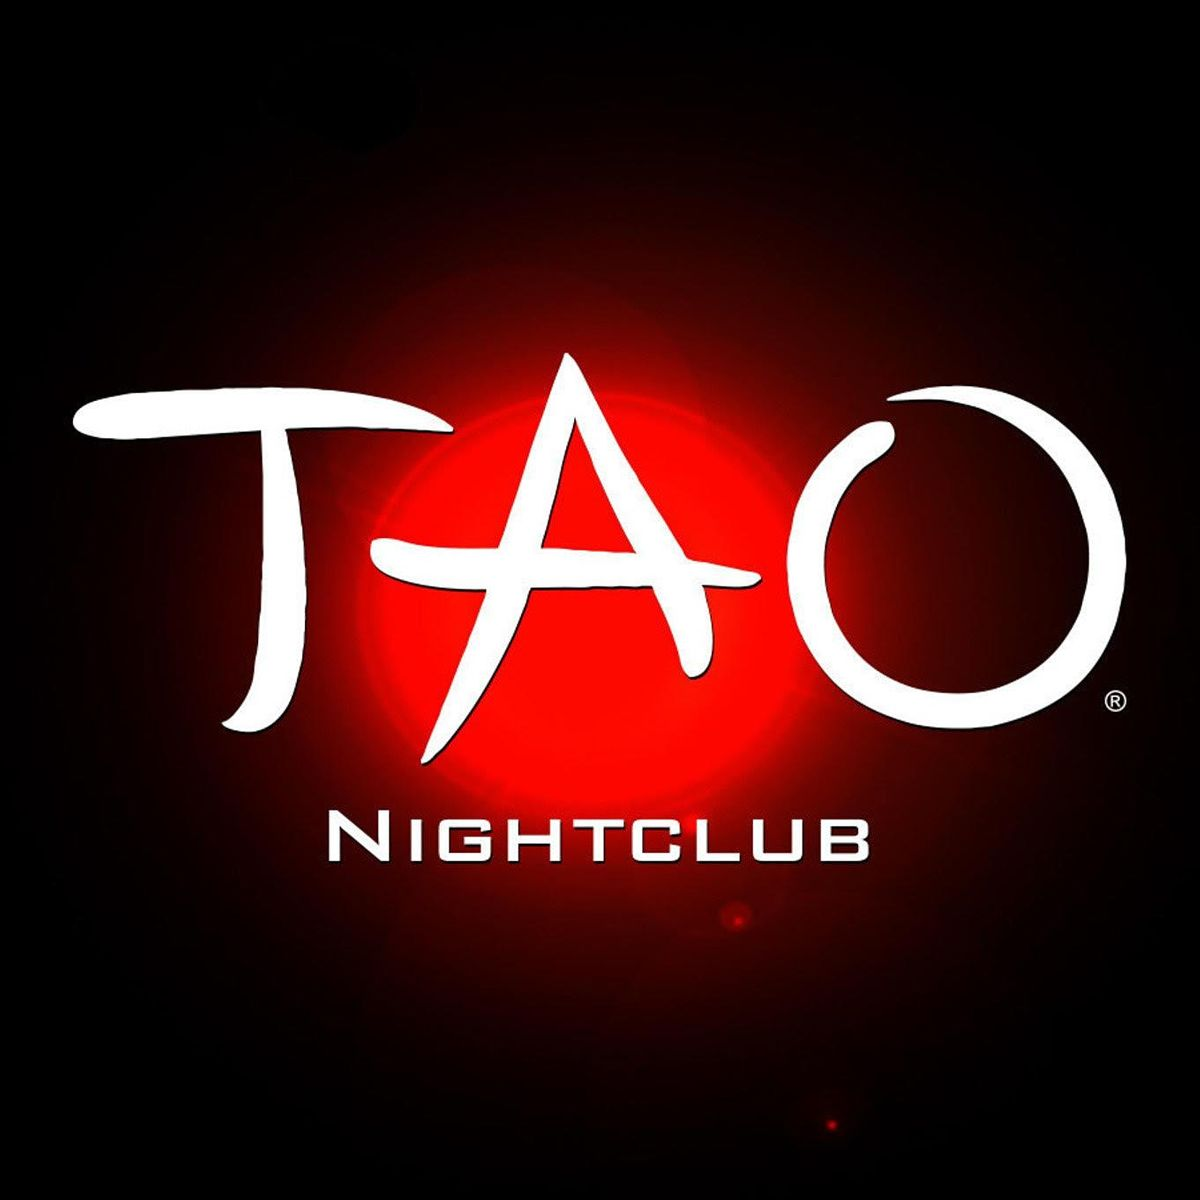 TAO NIGHTCLUB- The #1 Hip Hop Club in Las Vegas!!!